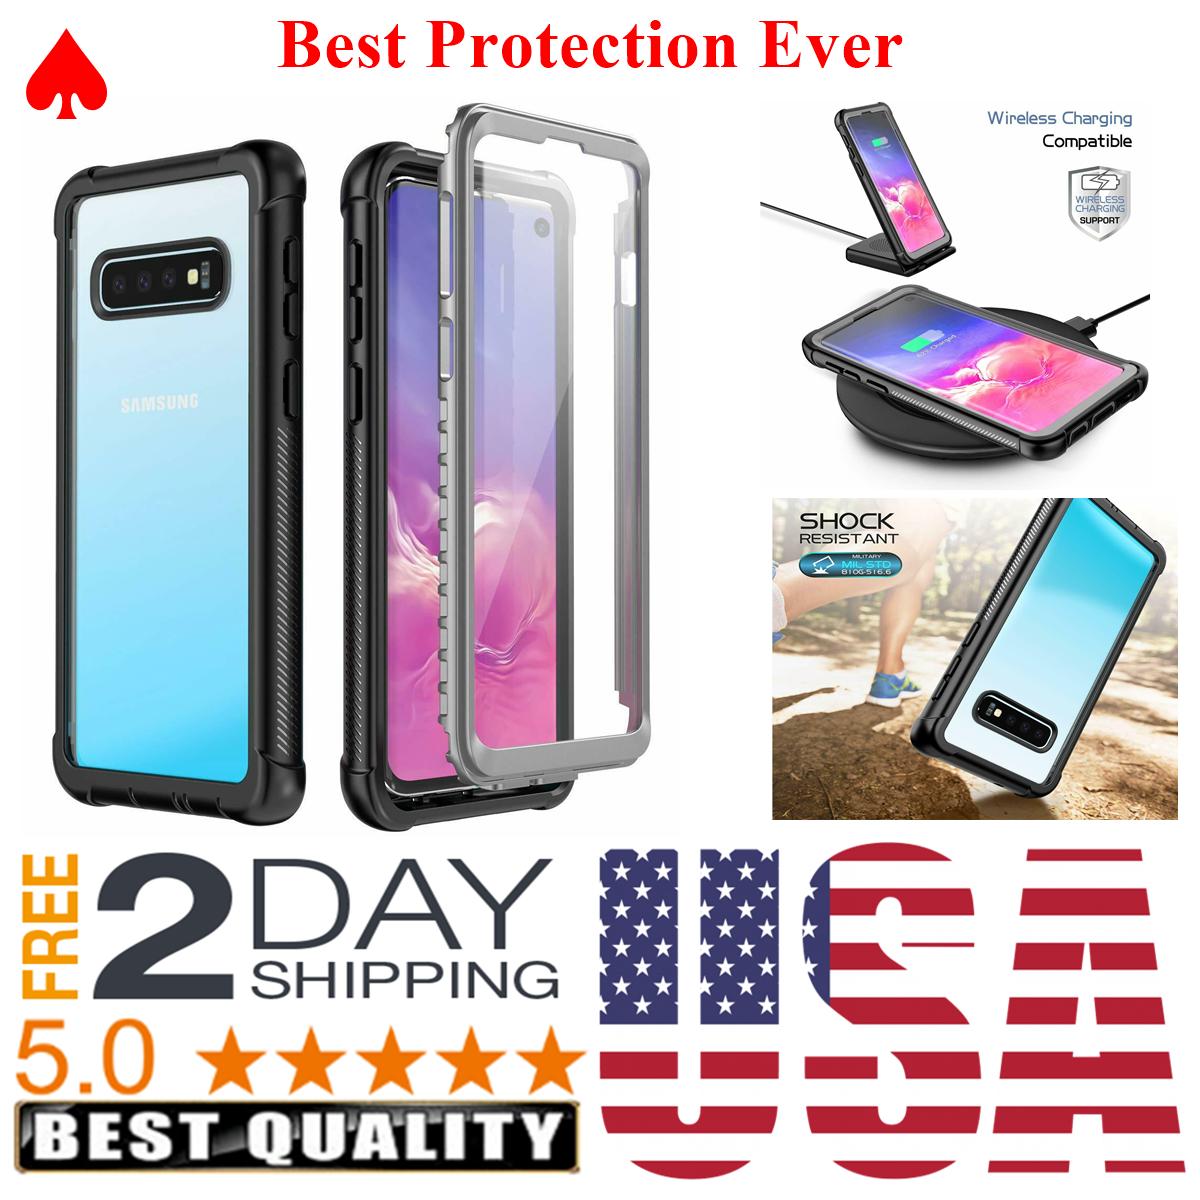 Estuche Para Samsung Galaxy S10 Protector De Pantalla Incorporado Proteccion - $18.99